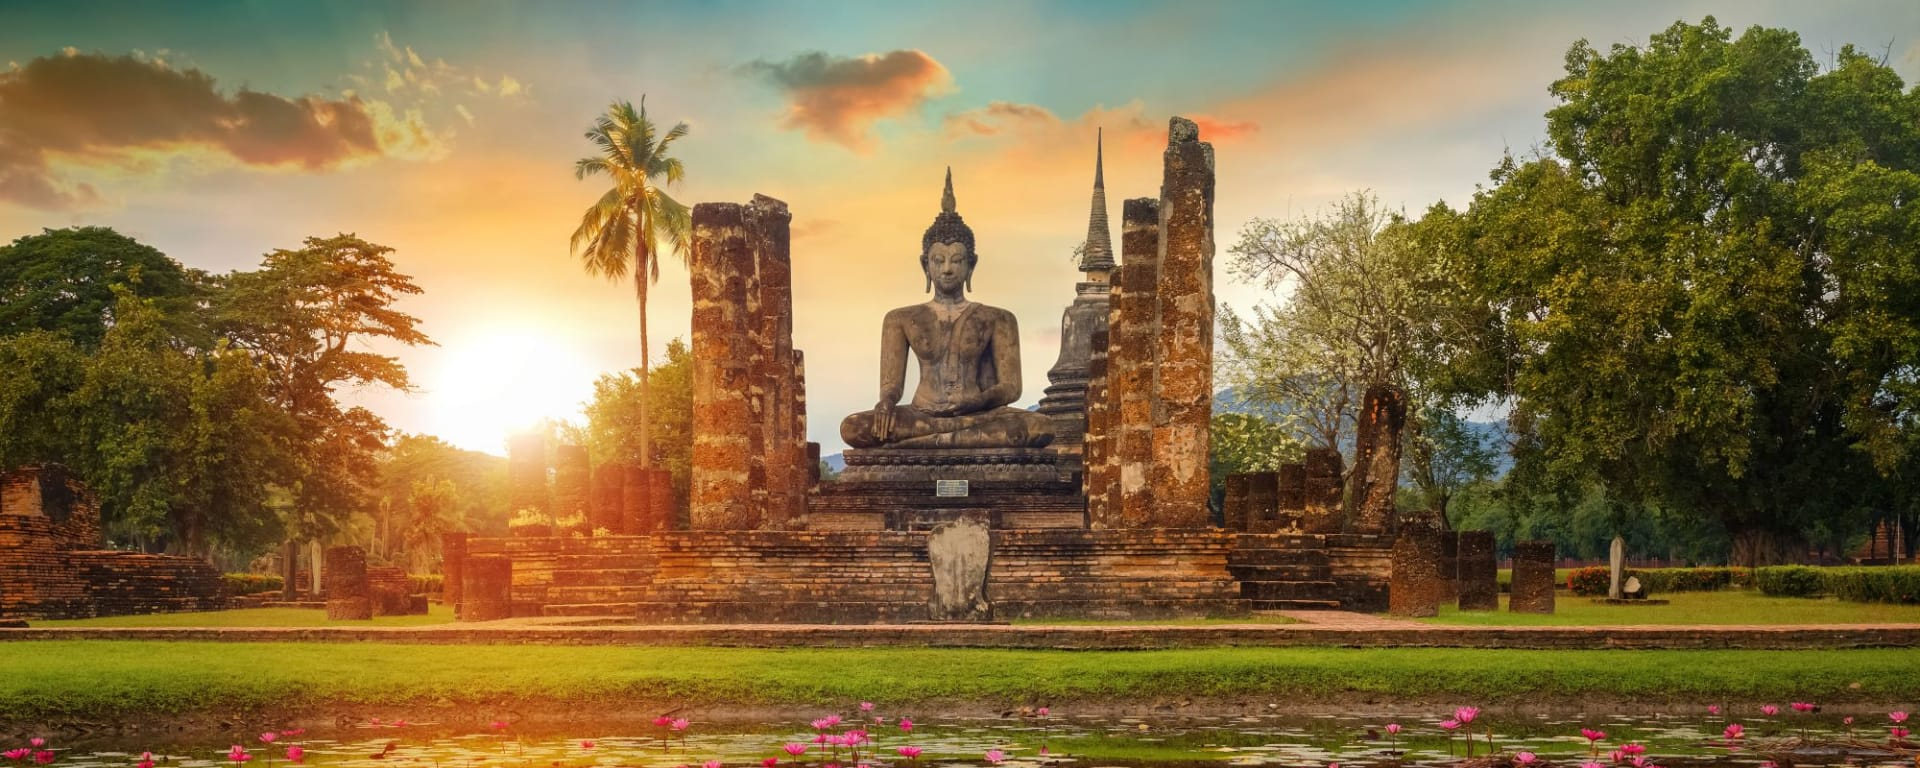 Glanzlichter Thailands ab Bangkok: Sukhothai Wat Mahathat Temple